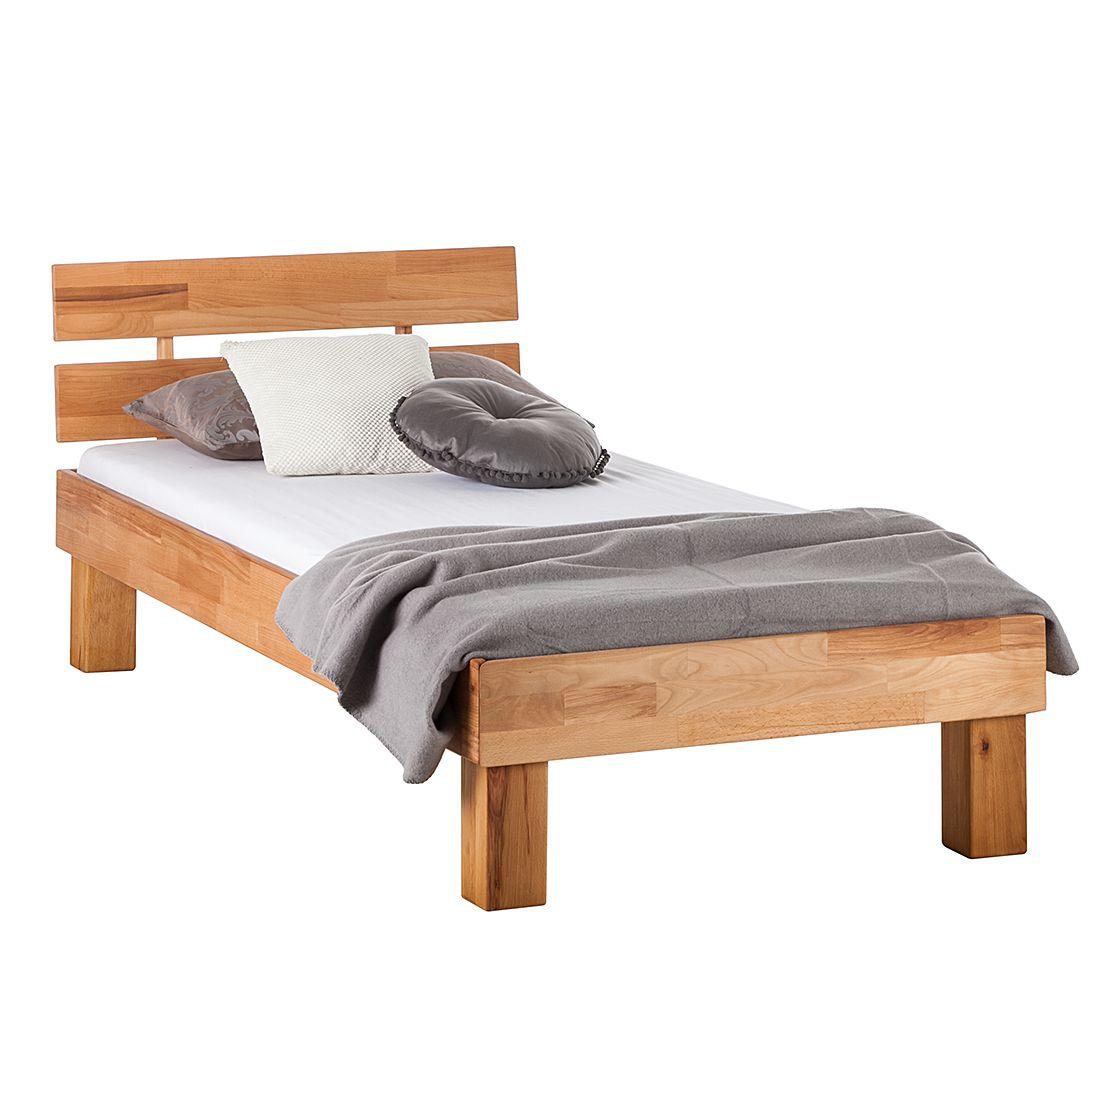 Massivholzbett Areswood Massivholzbett Bett Bettgestell